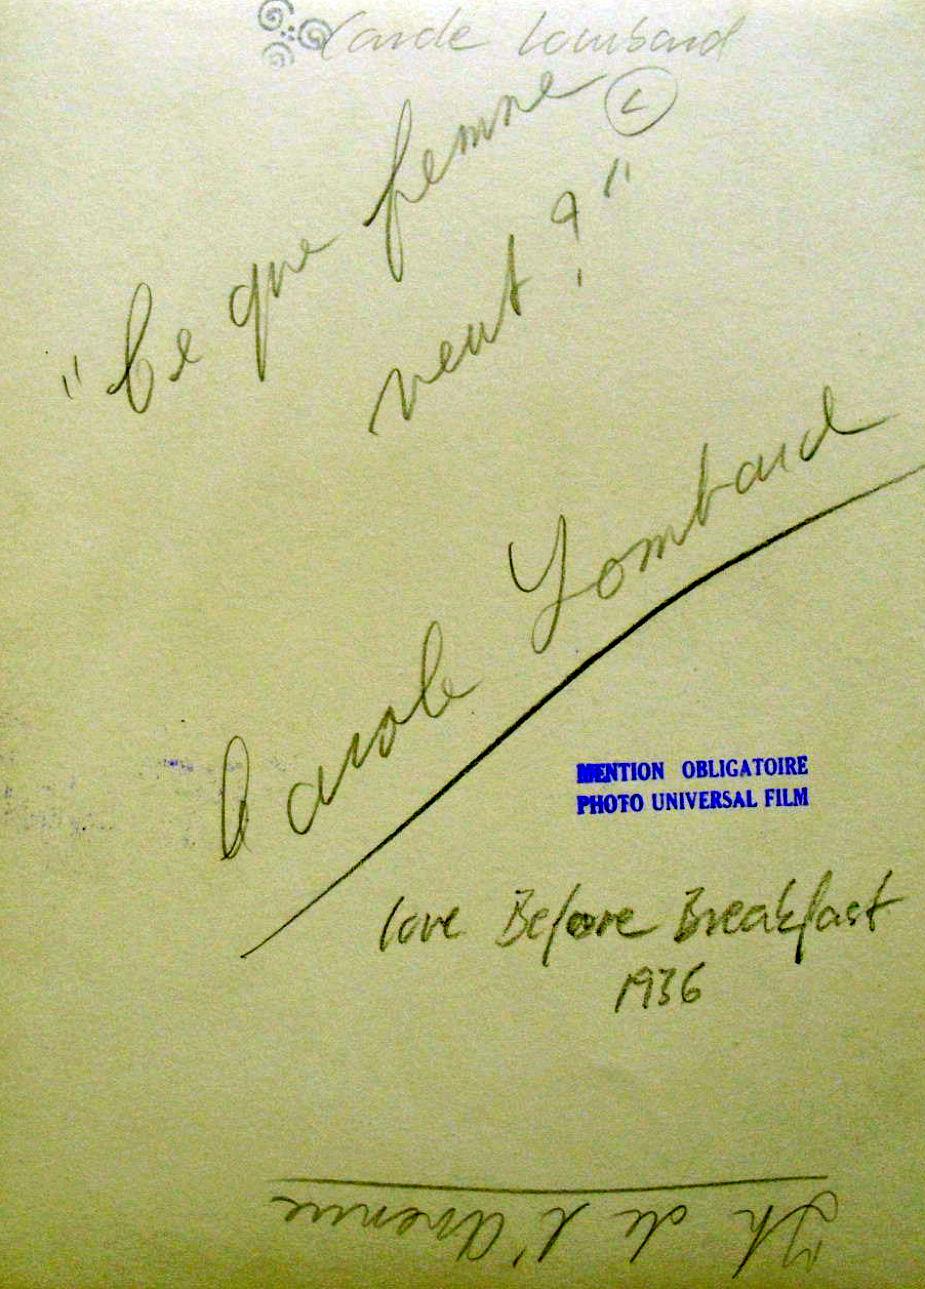 carole lombard love before breakfast 24a back